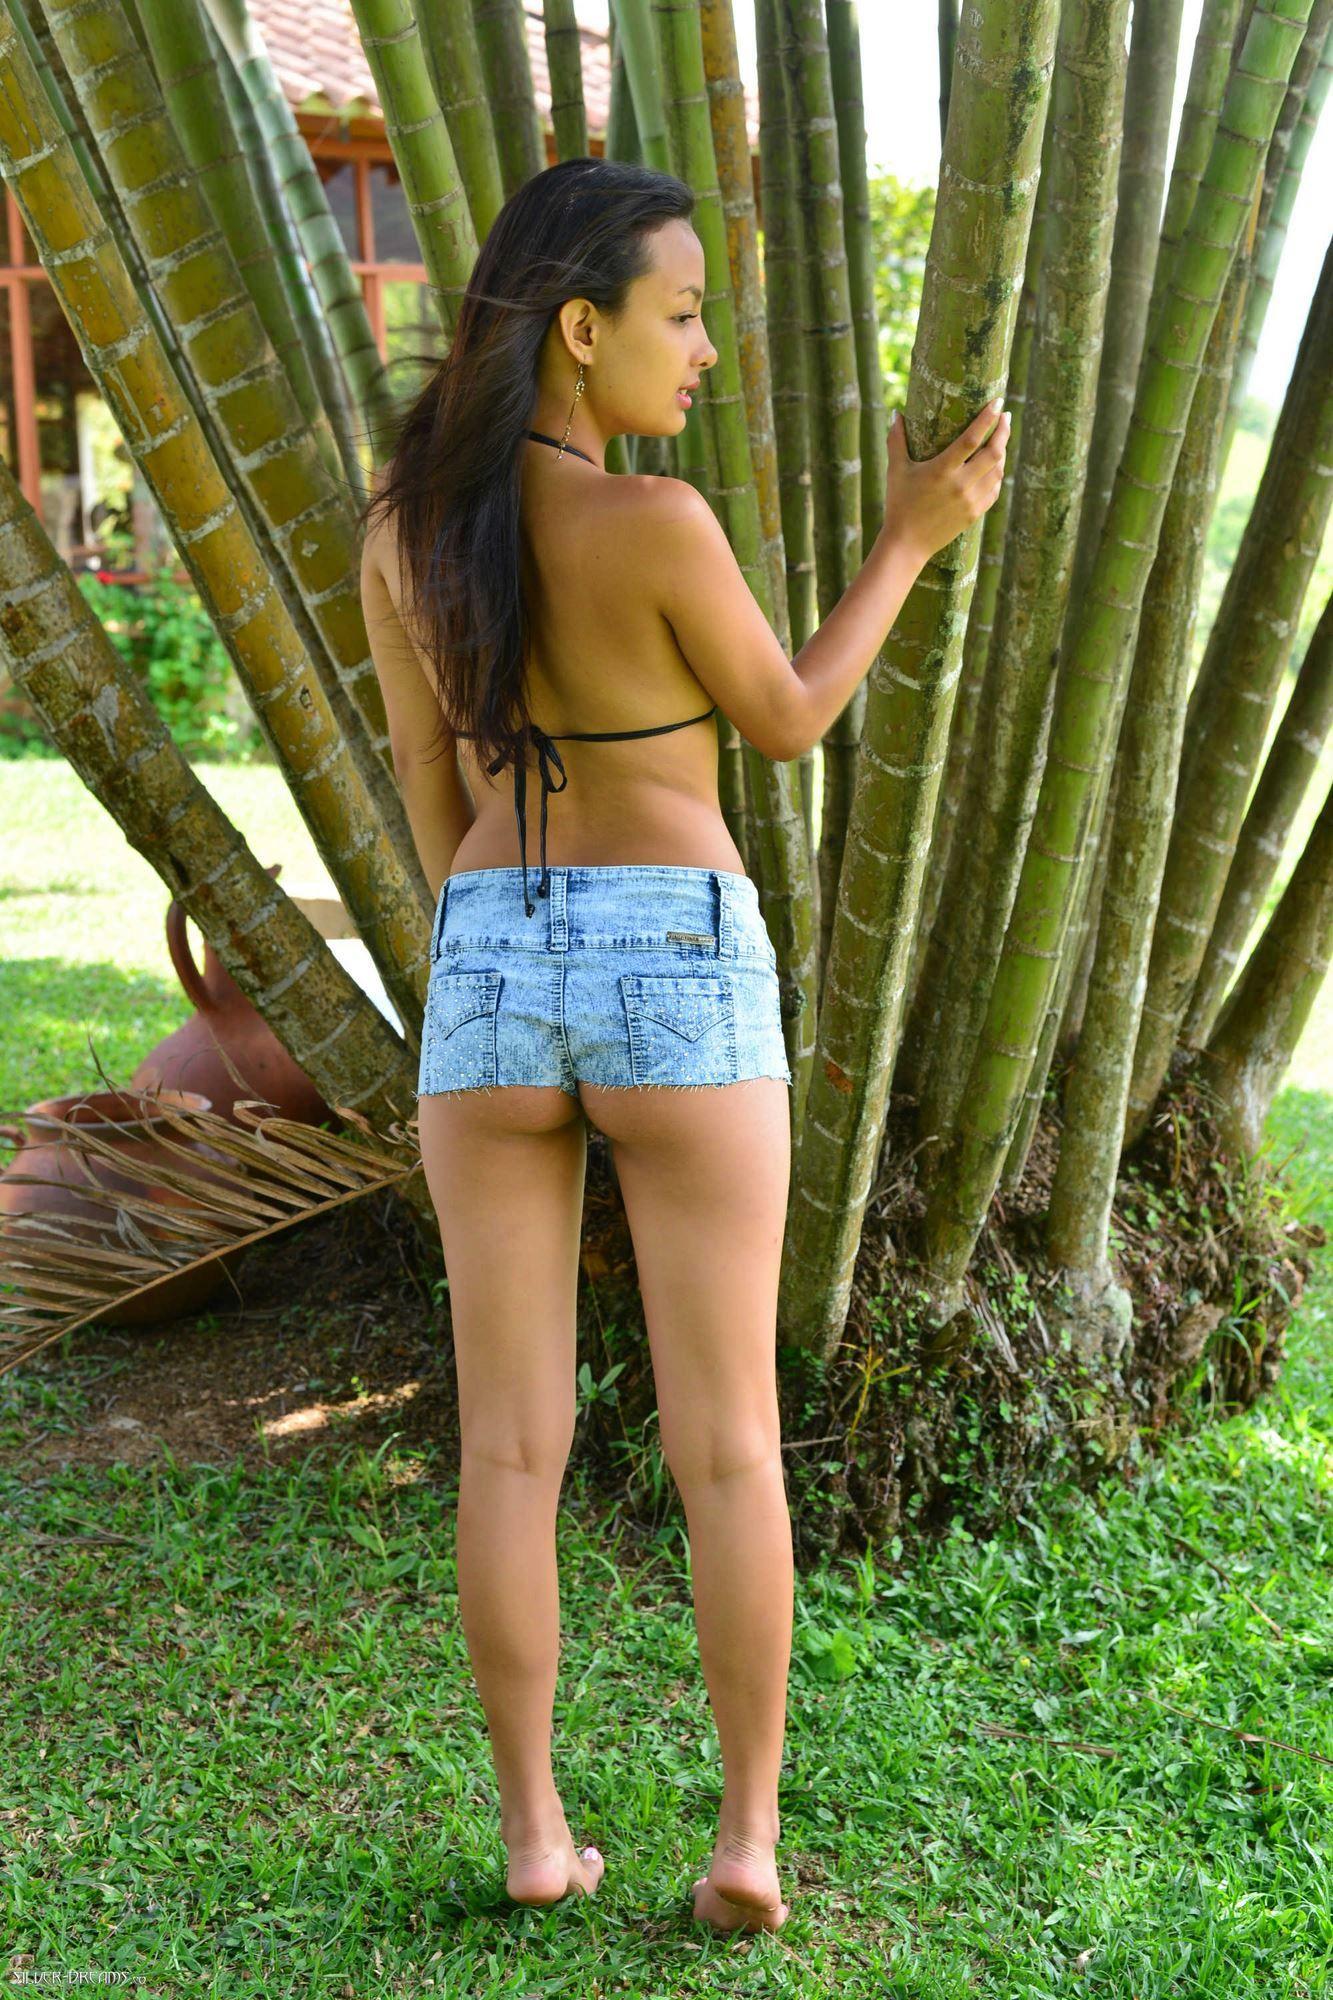 Naked amateur outside voluptuous girls